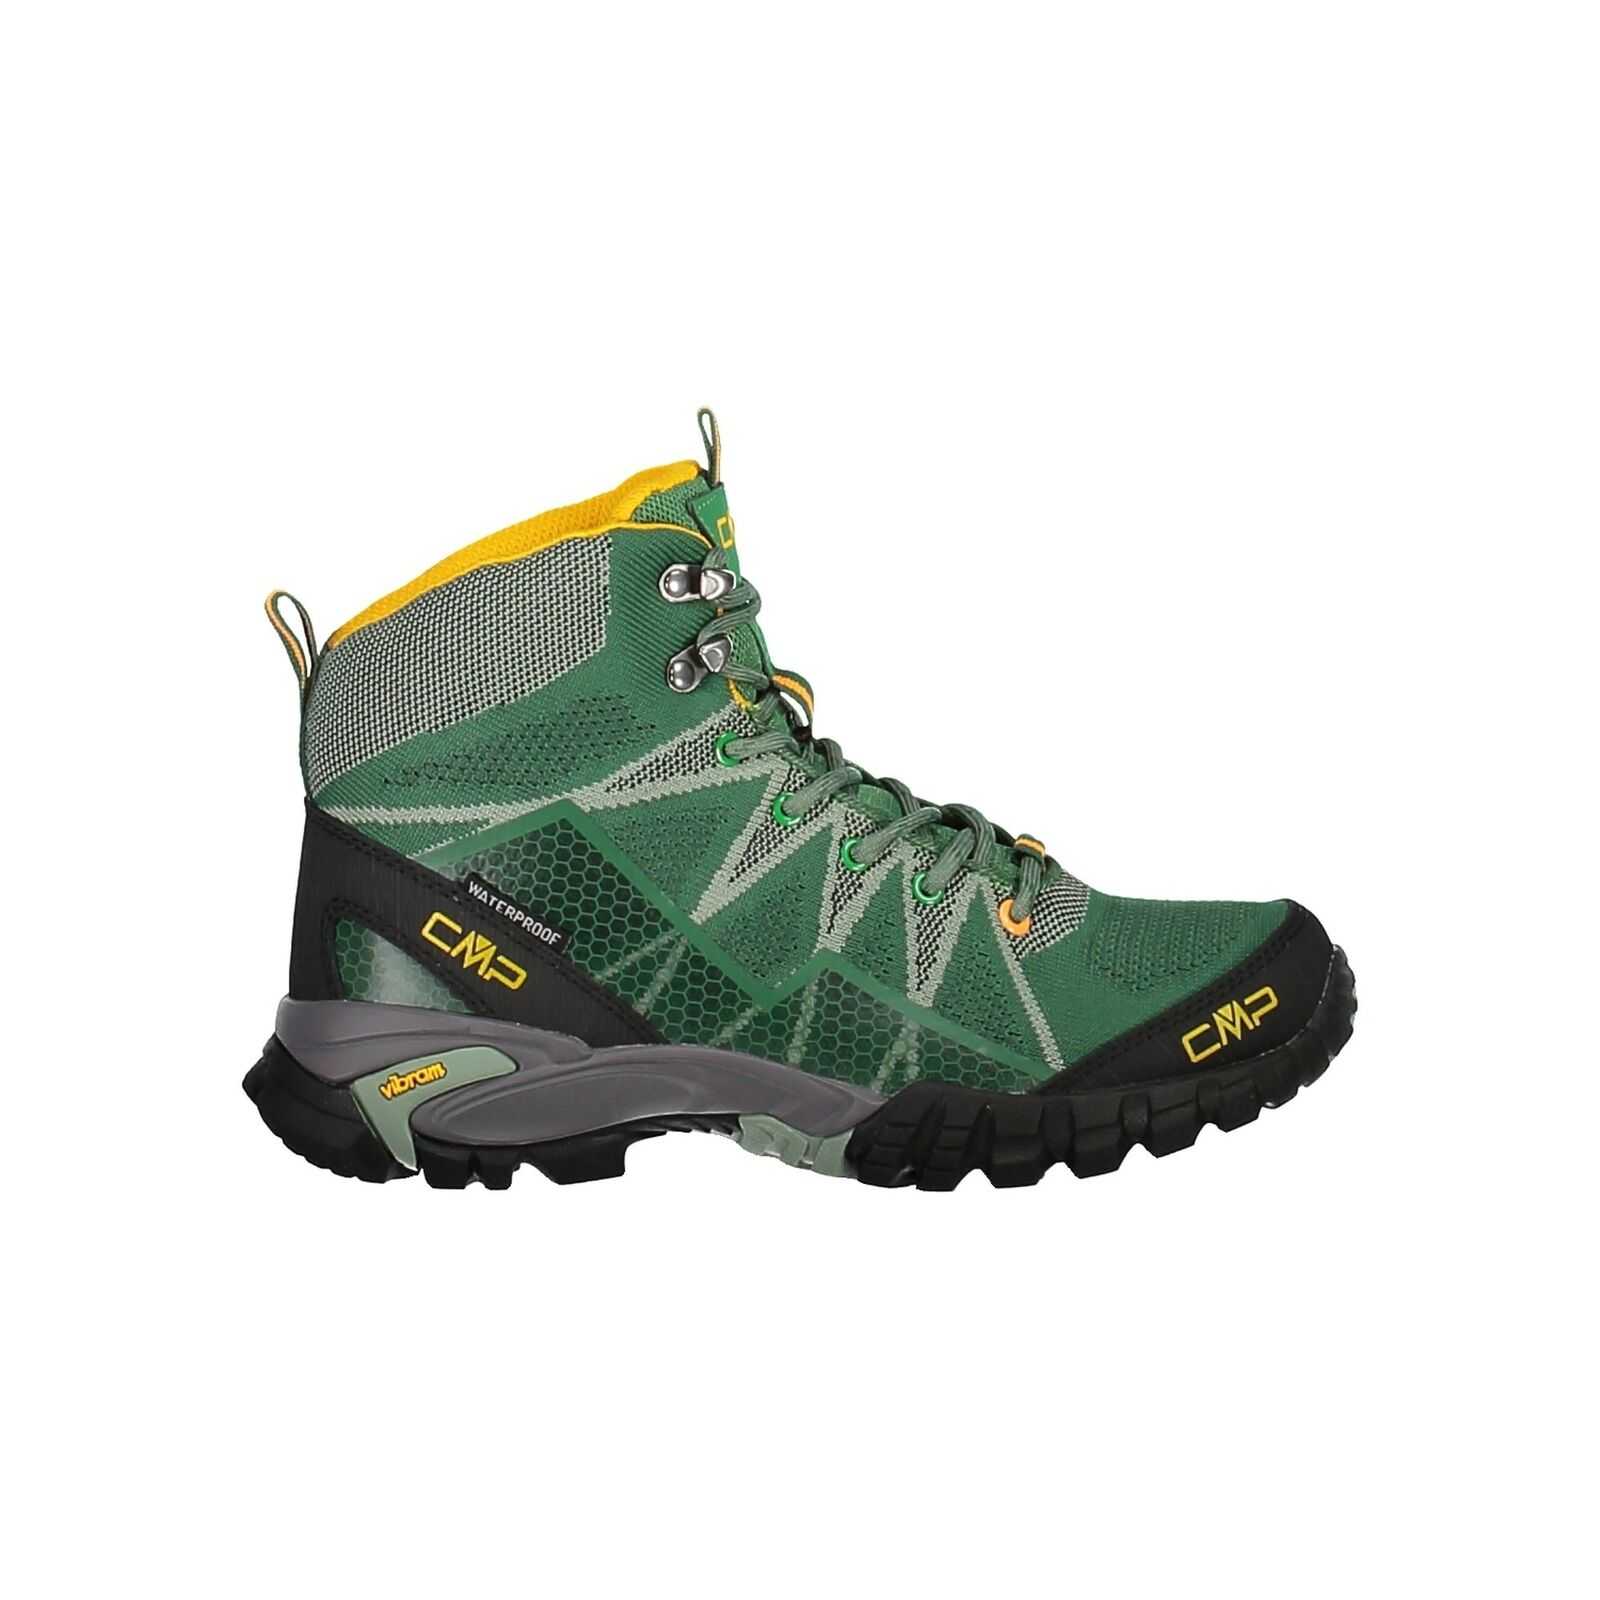 CMP Trekking shoes Outdoorschuh Tauri mid Wmn Trekking shoes Wp Green Waterproof